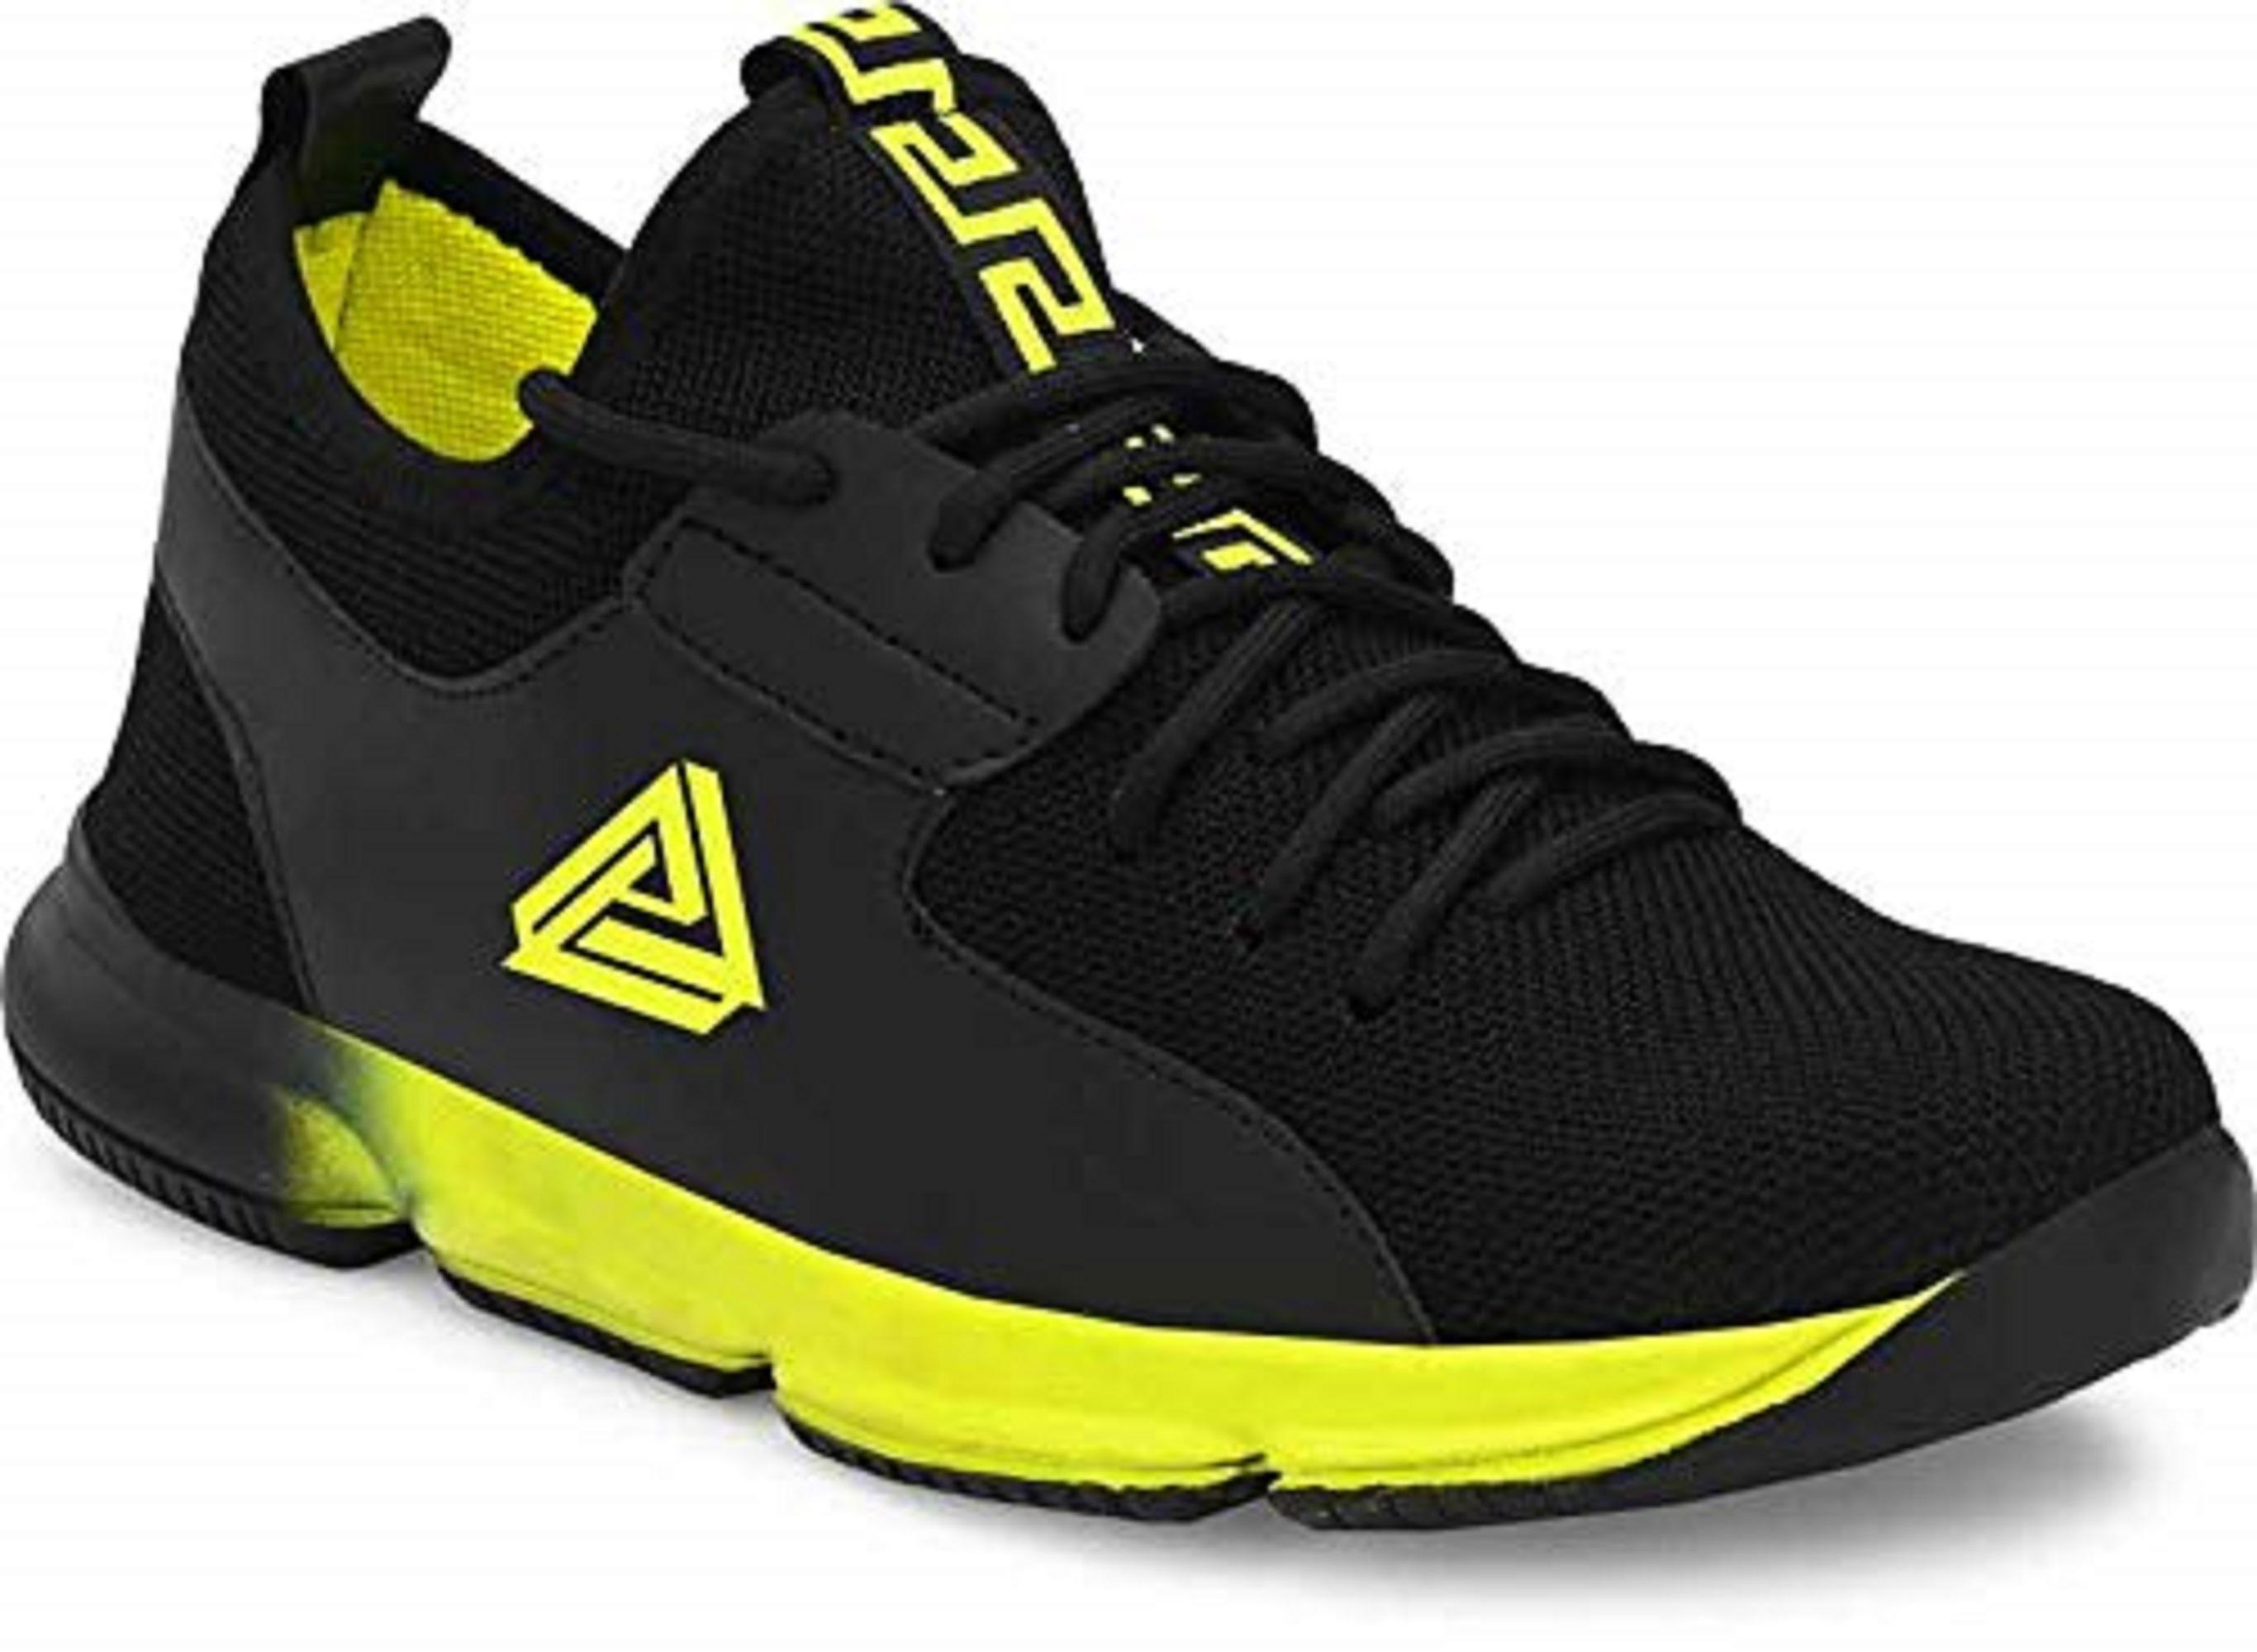 SURAB Present Premium Quality Men's Sports Shoes MSG_077-Green (Green, 6-9, 4 PAIR)